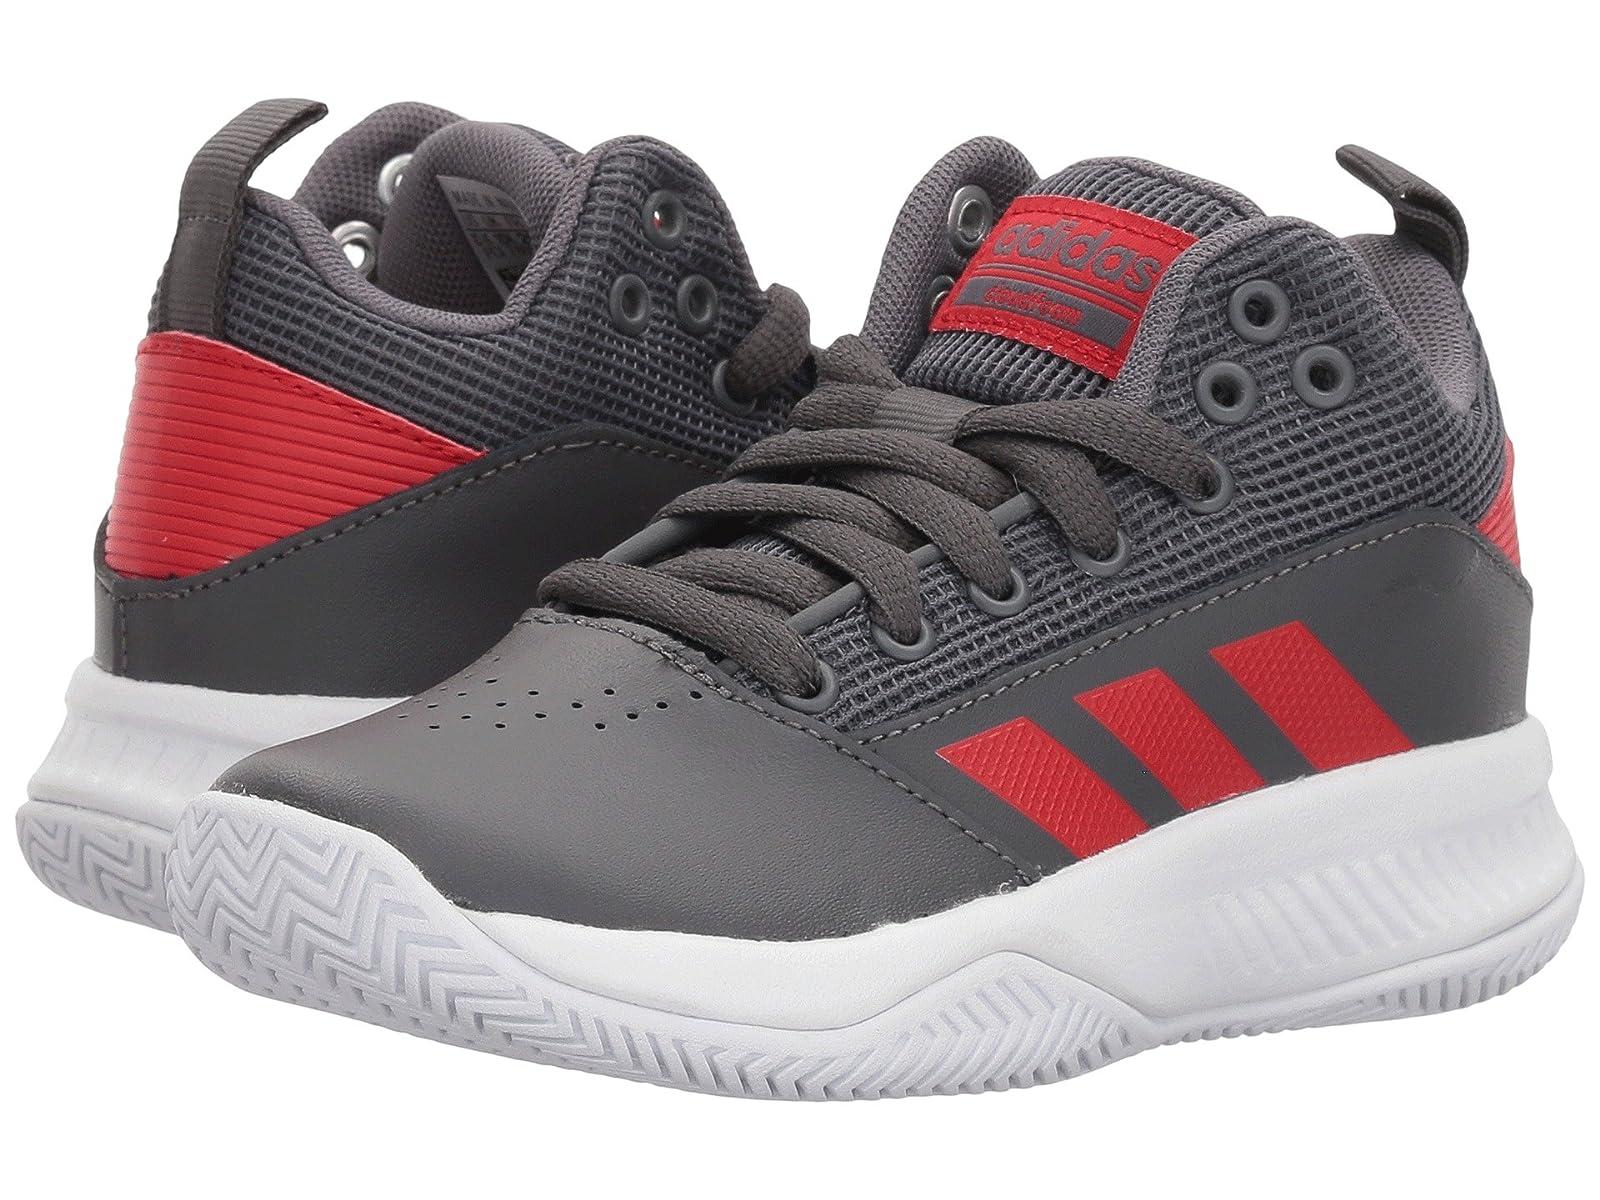 adidas Kids Ilation Mid Basketball (Little Kid/Big Kid)Atmospheric grades have affordable shoes